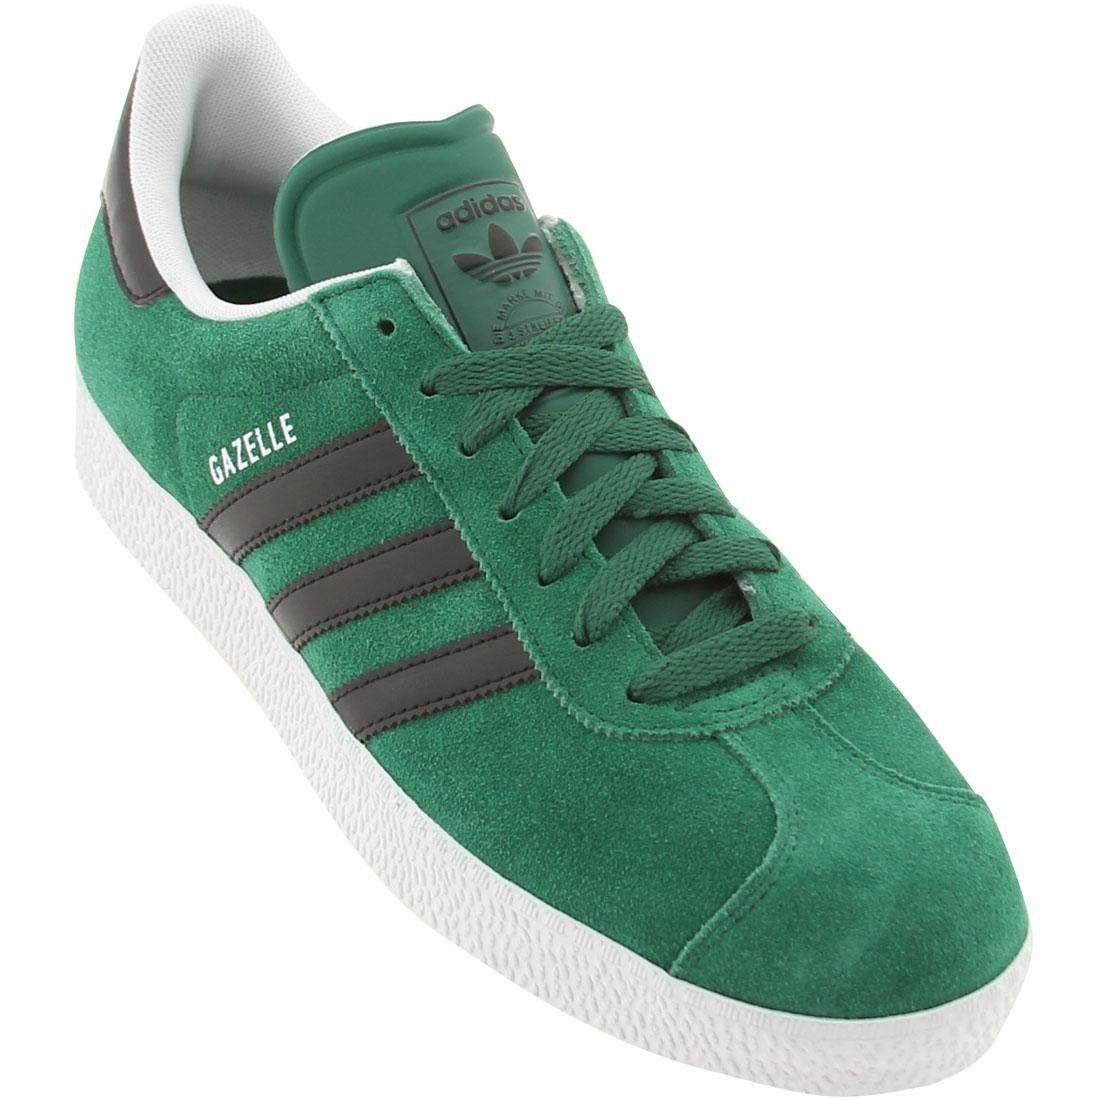 Mens Adidas Gazelle Ii Dark Green/Black/White Trainers